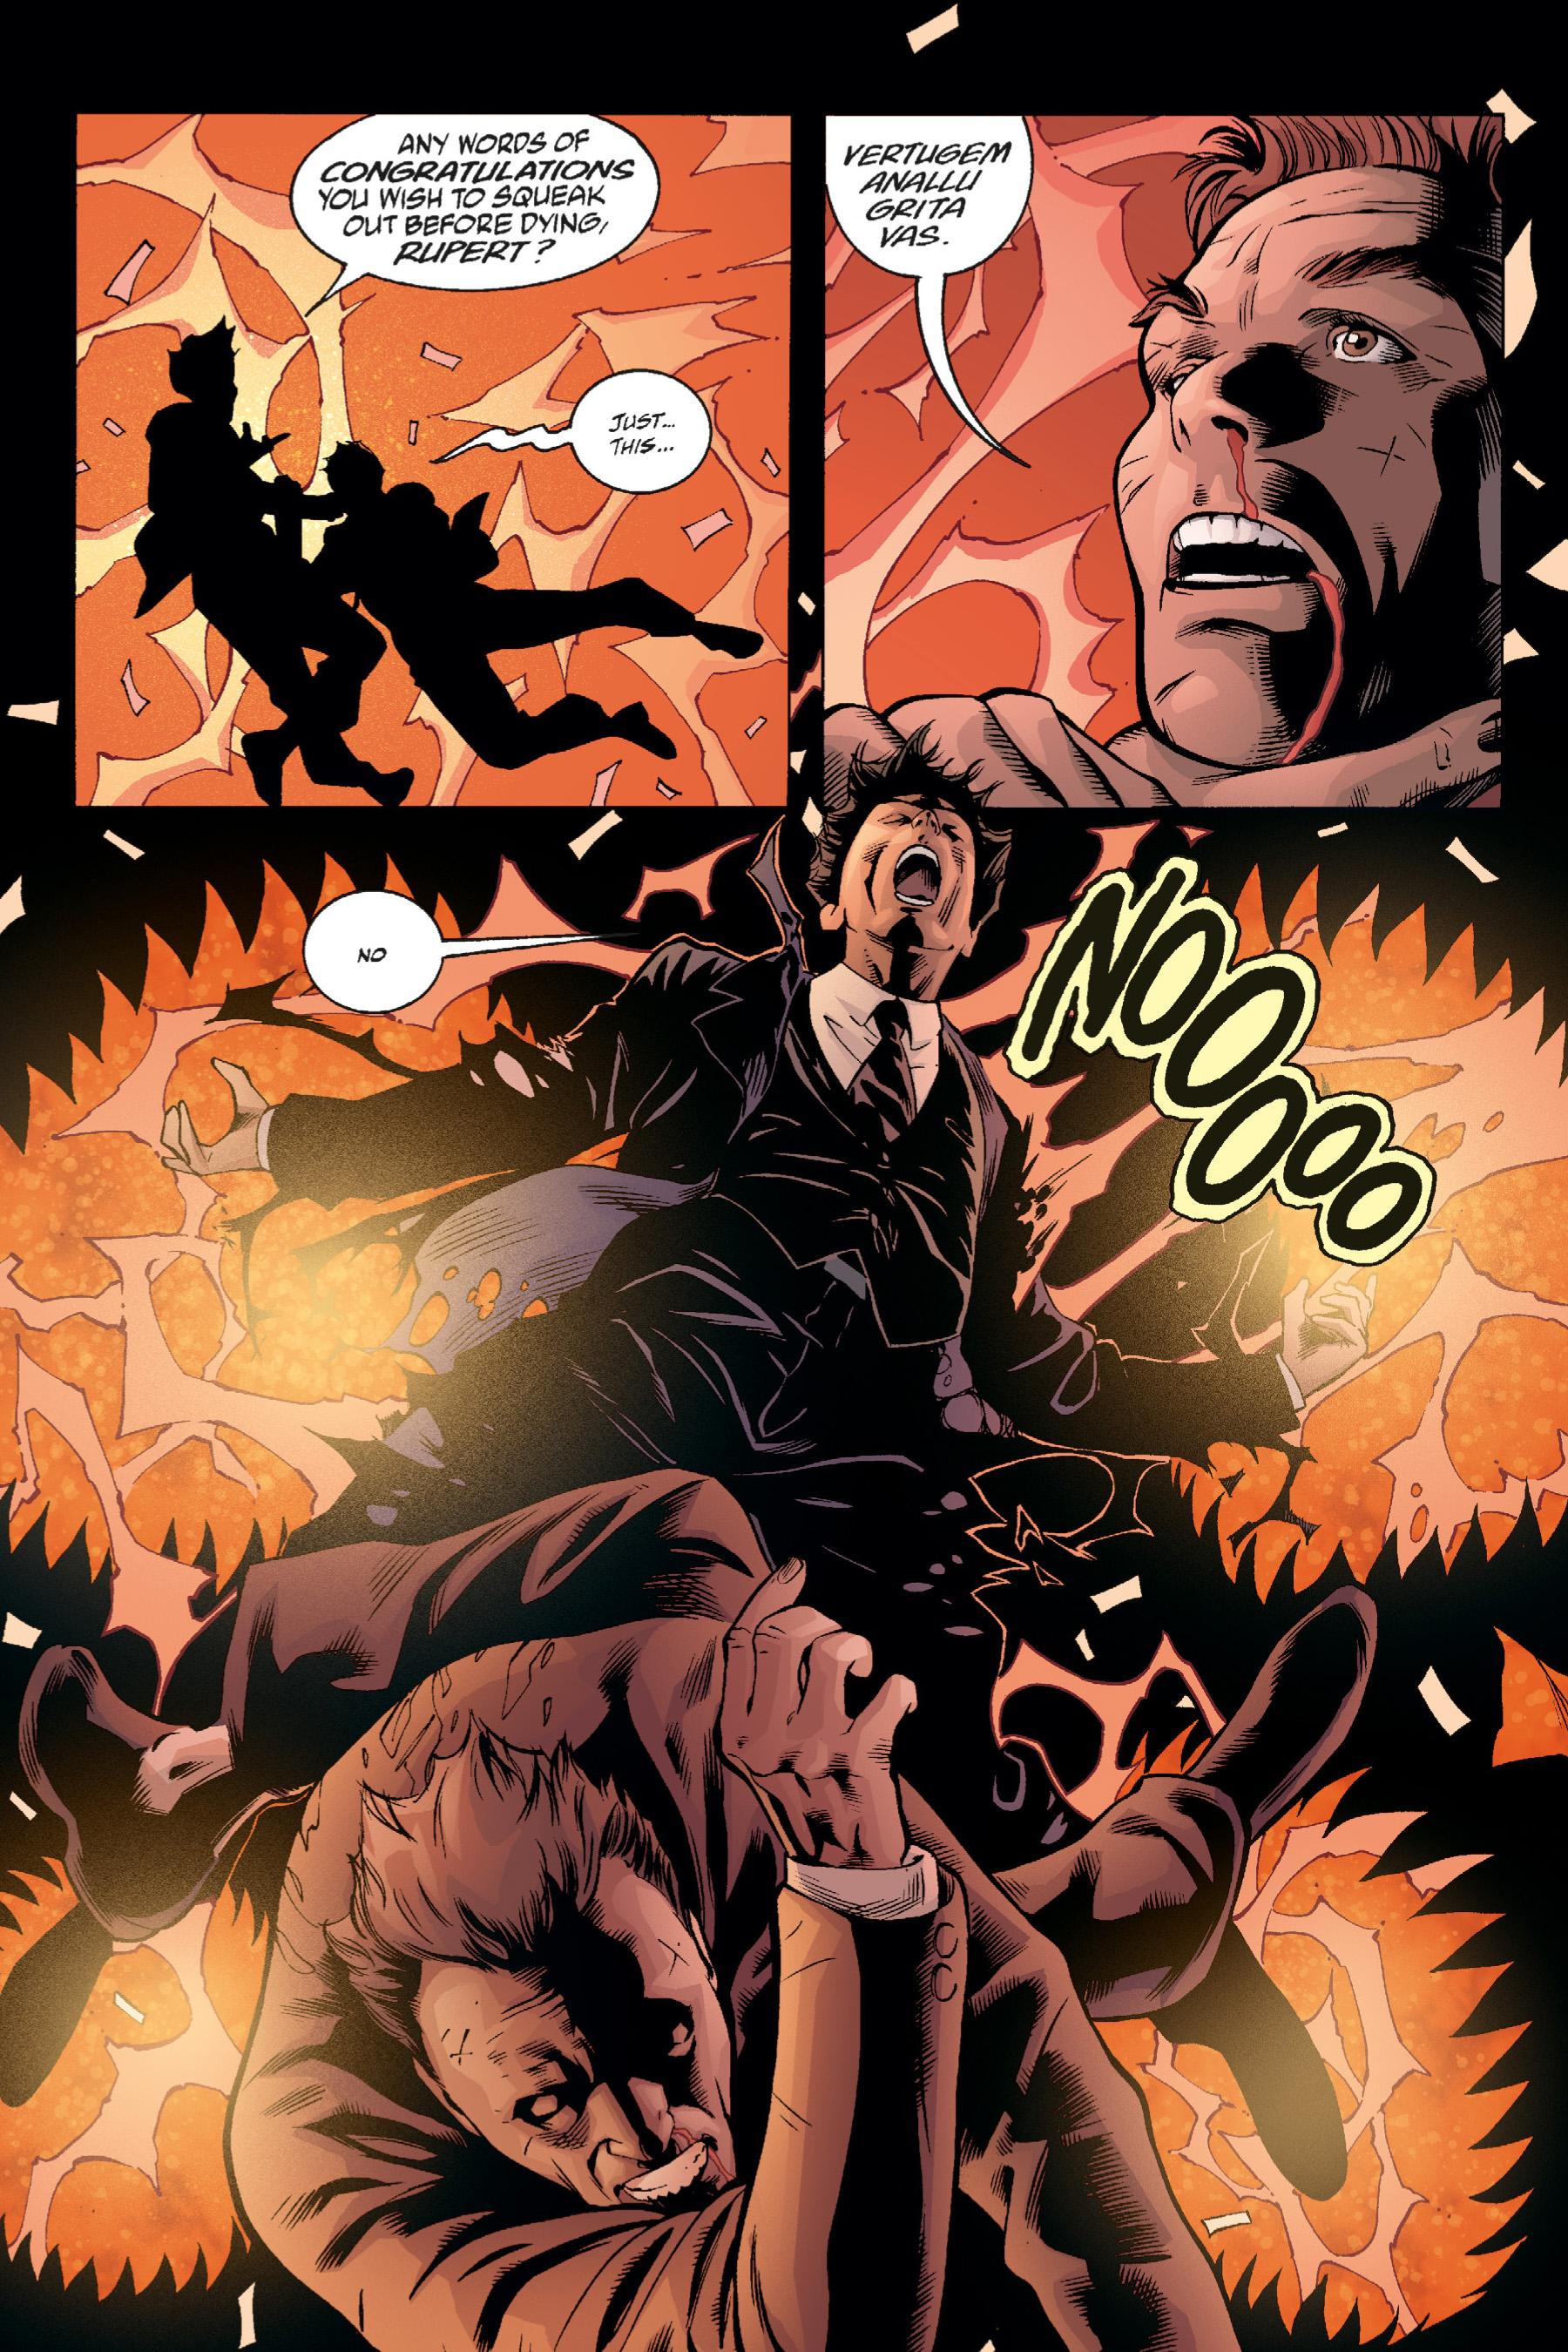 Read online Buffy the Vampire Slayer: Omnibus comic -  Issue # TPB 1 - 179